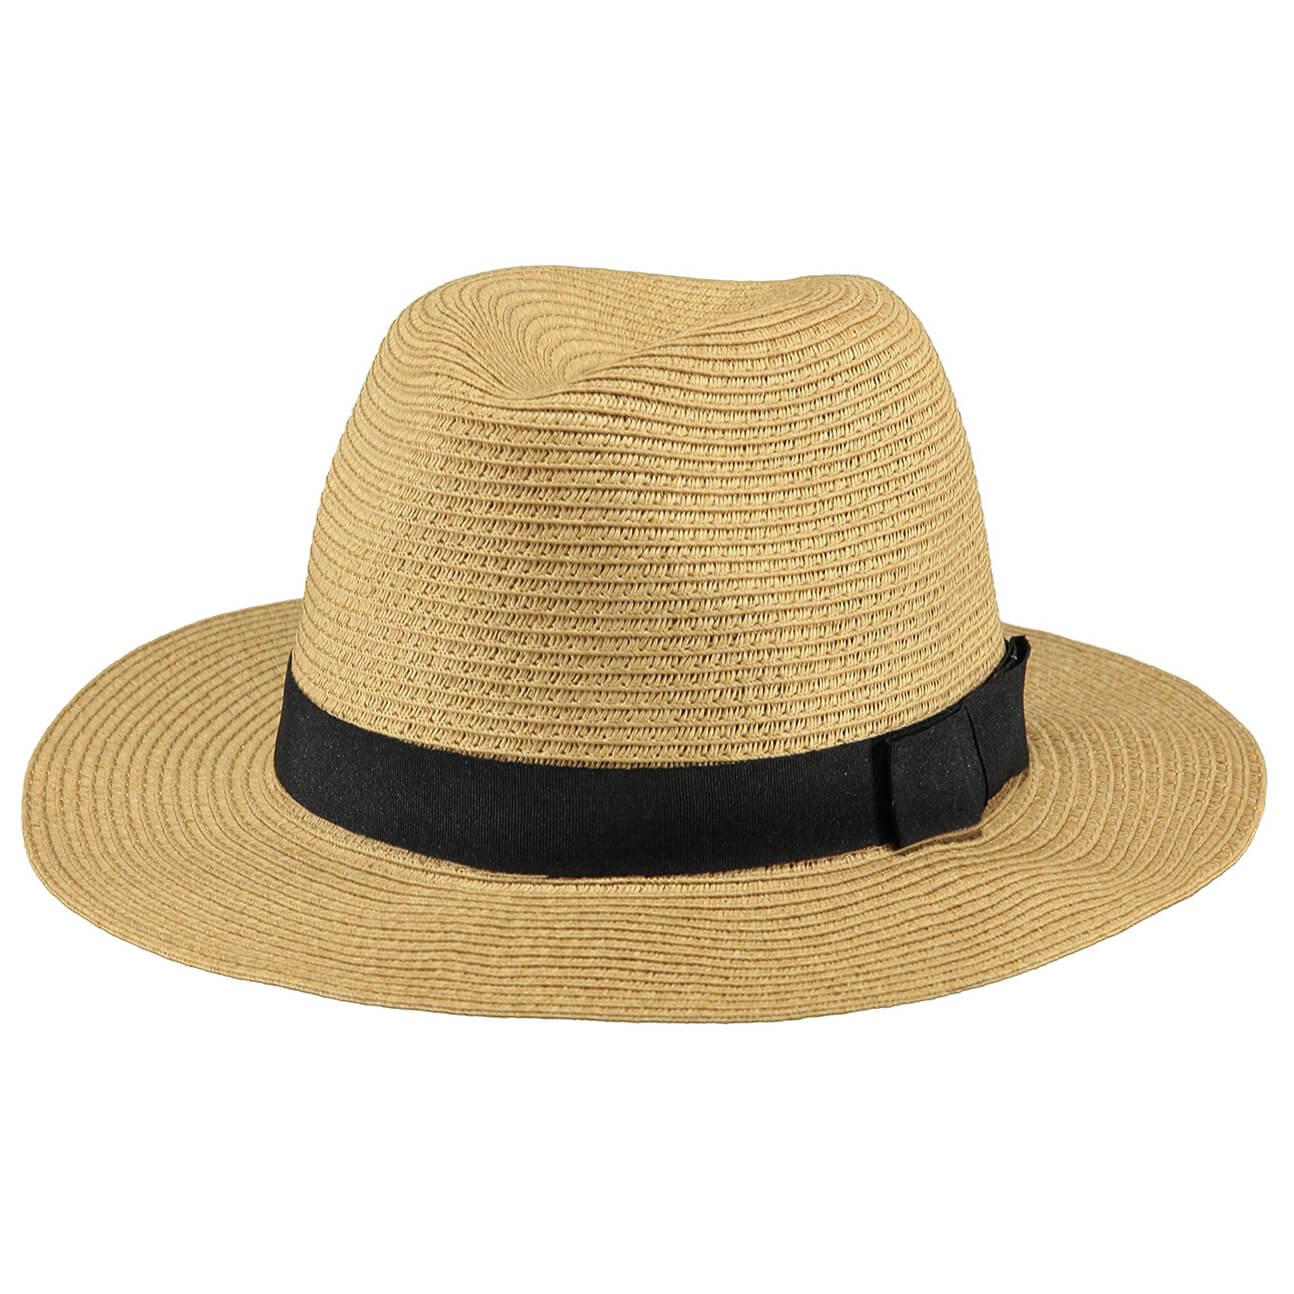 Barts Aveloz Hat - Hatt köp online  8d49cef8de2c5